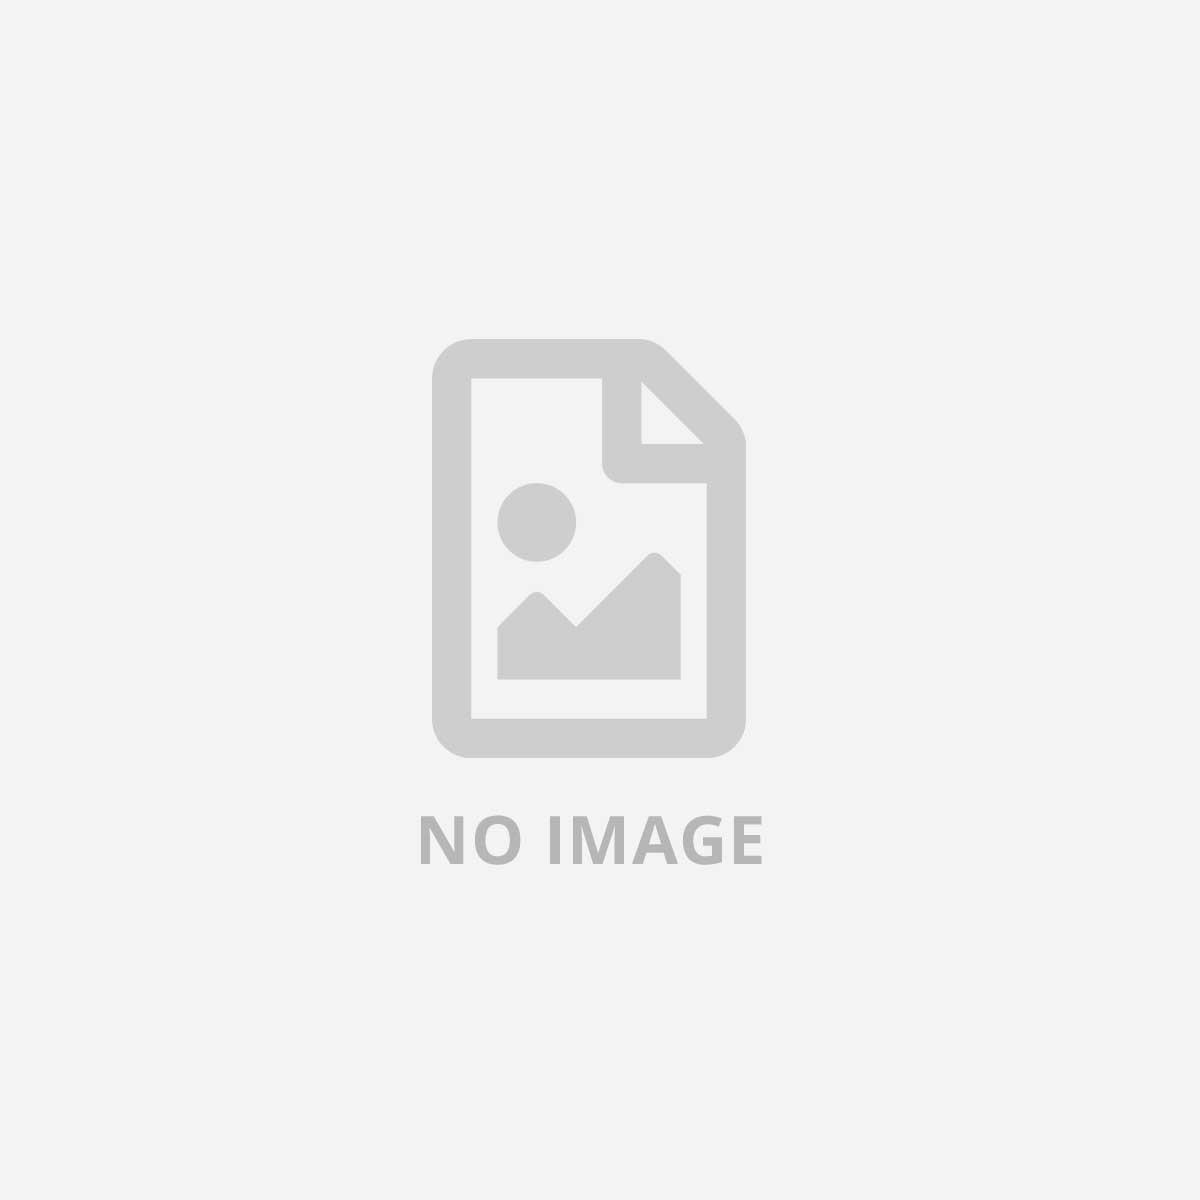 KOH-I-NOOR CORNICE CRILEX 12X29 7 CM